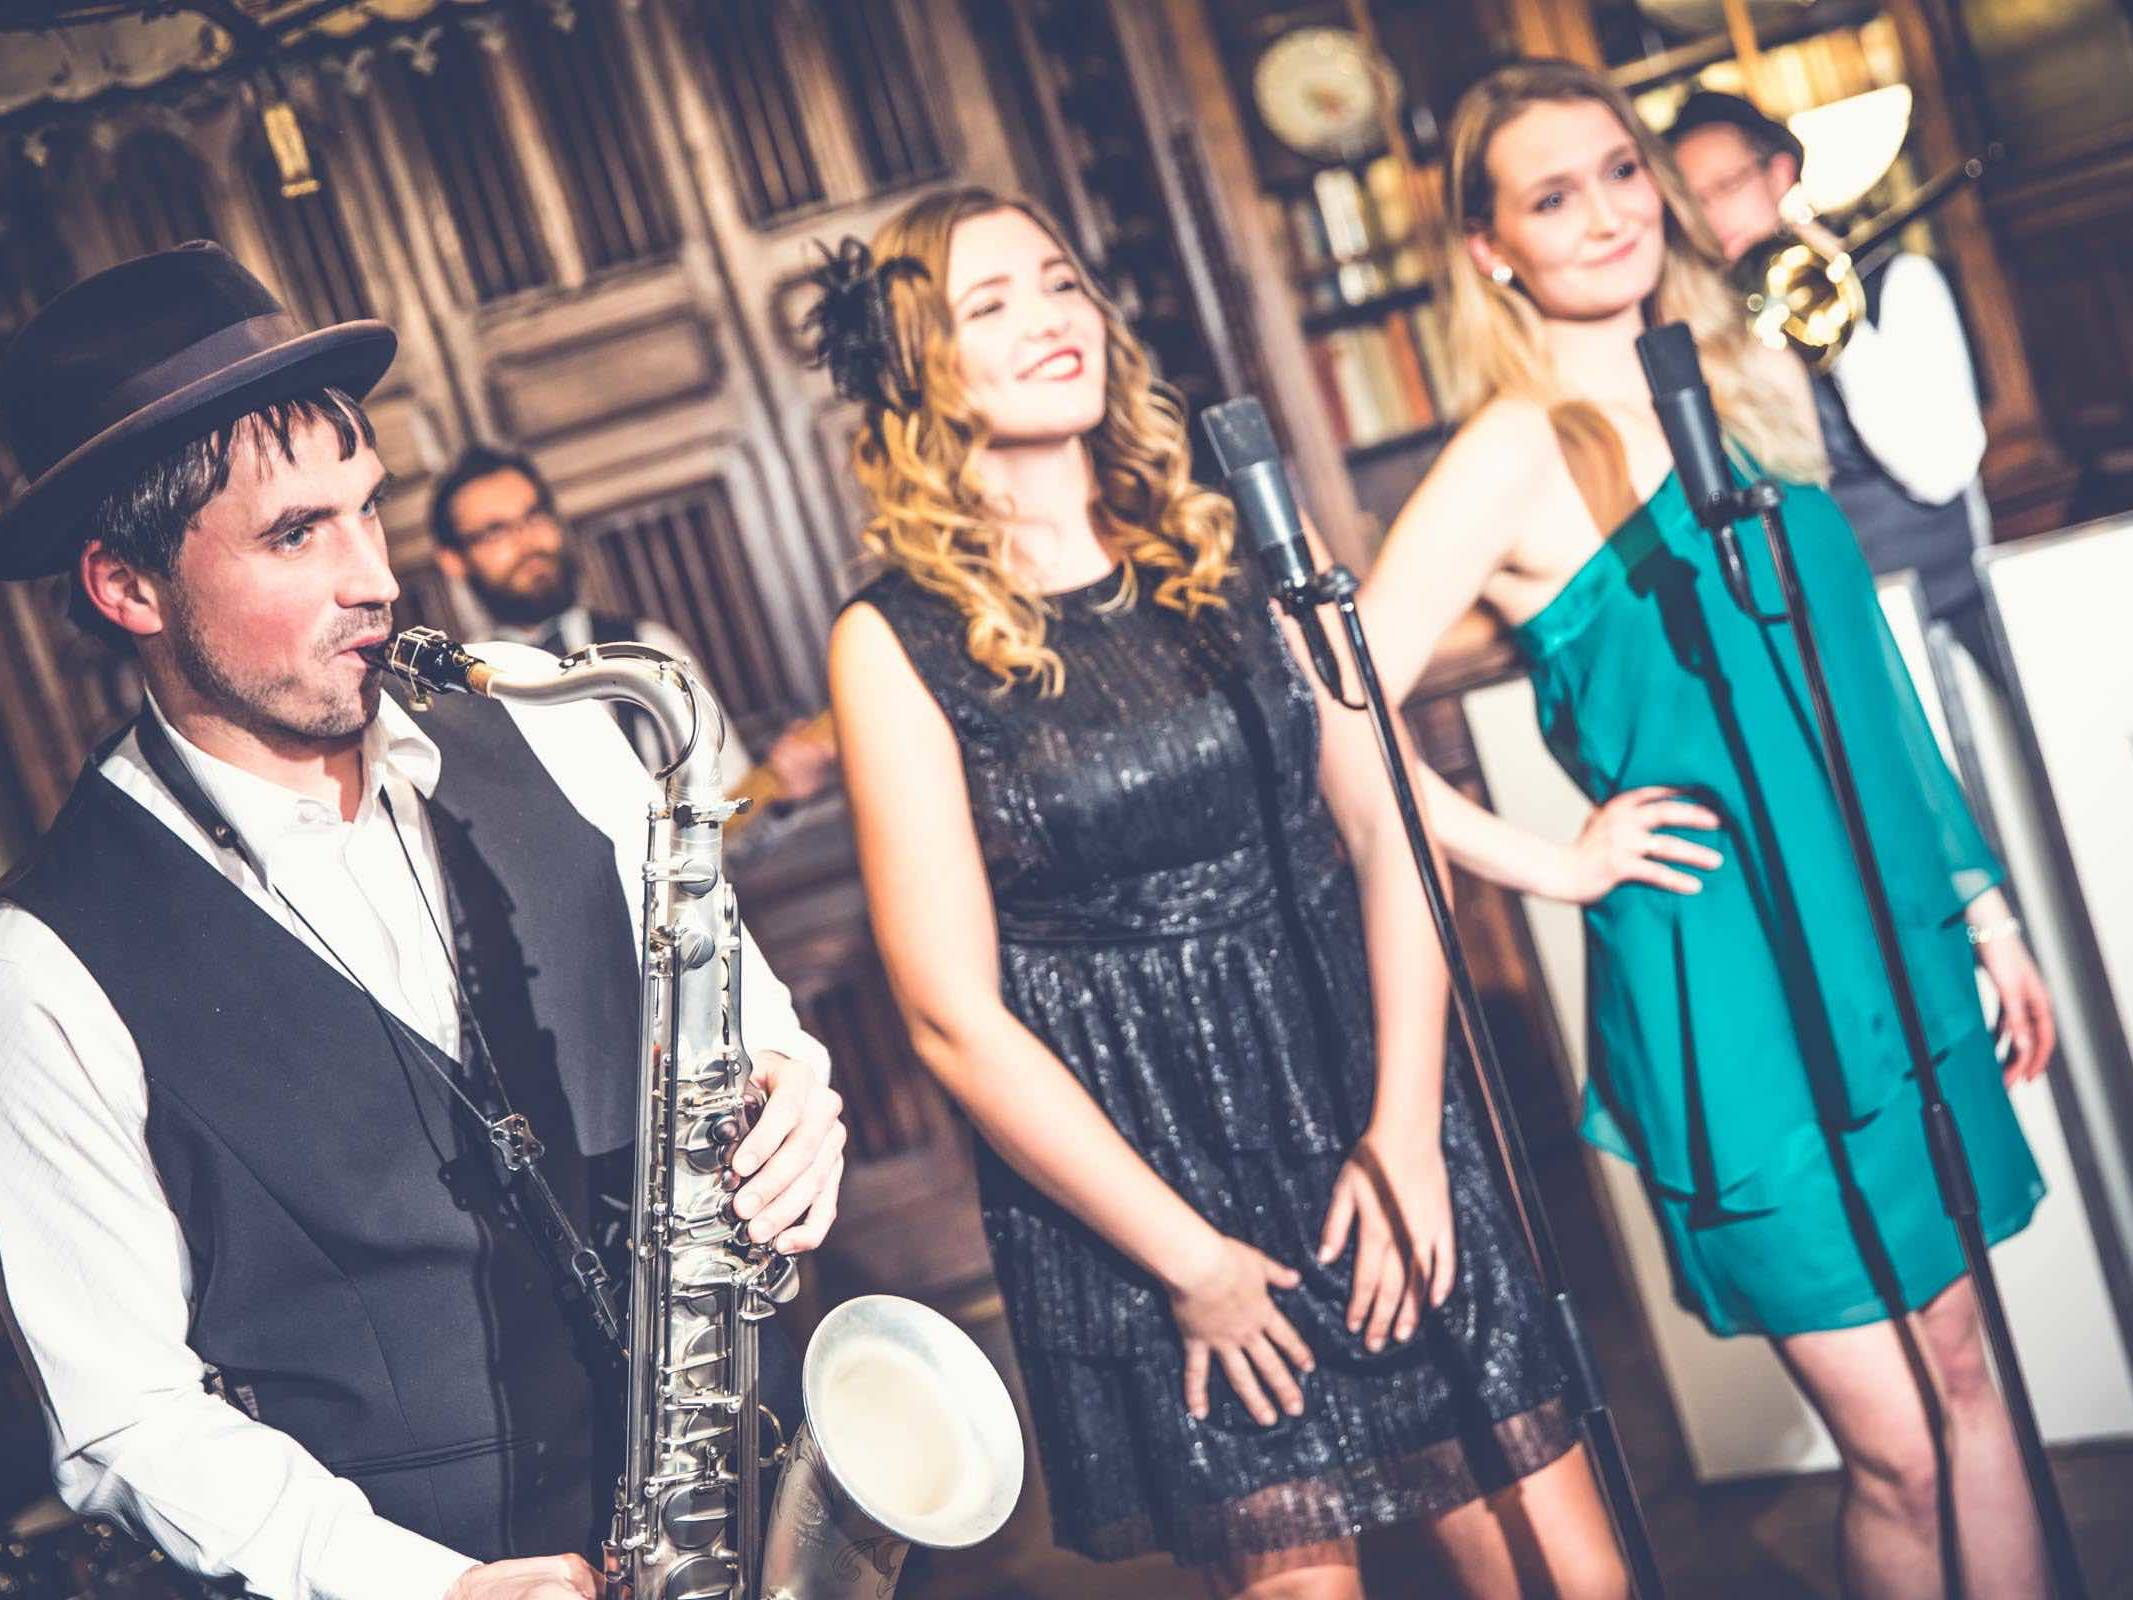 Band | Hamburg | Liveband | Livemusik | Walking | Act | Partyband | Jazzband | Swingband | Loungeband | Popband | Jazz | Saxophonist | Sängerin | Hochzeit | Messe | Firmenfeier | Charity | Gala | Buchen | Mieten | Hamburgfeiert